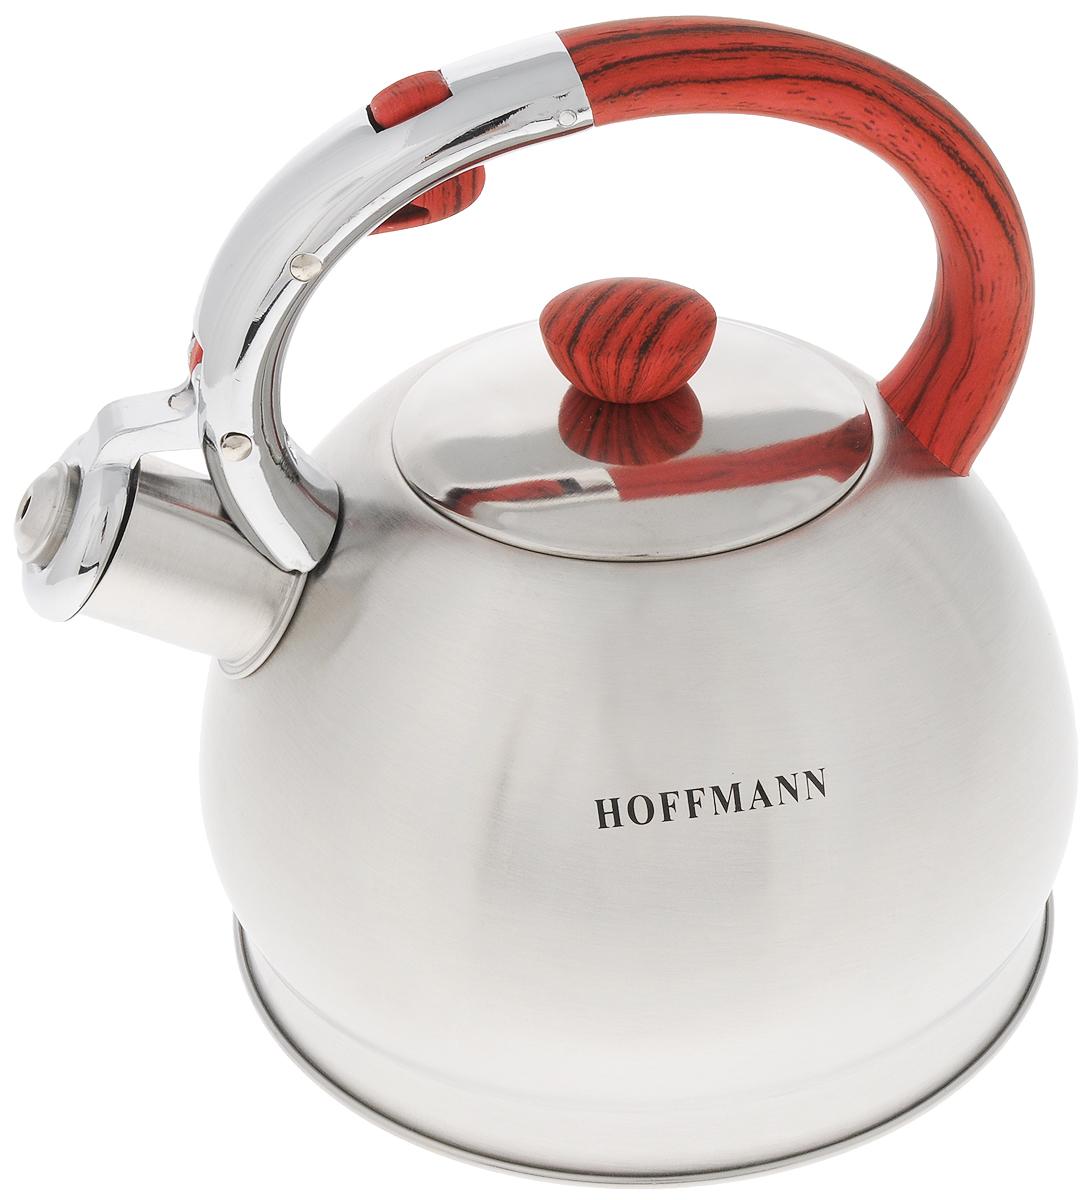 Чайник Hoffmann, со свистком, 2 л. НМ 5526/4НМ 5526/4